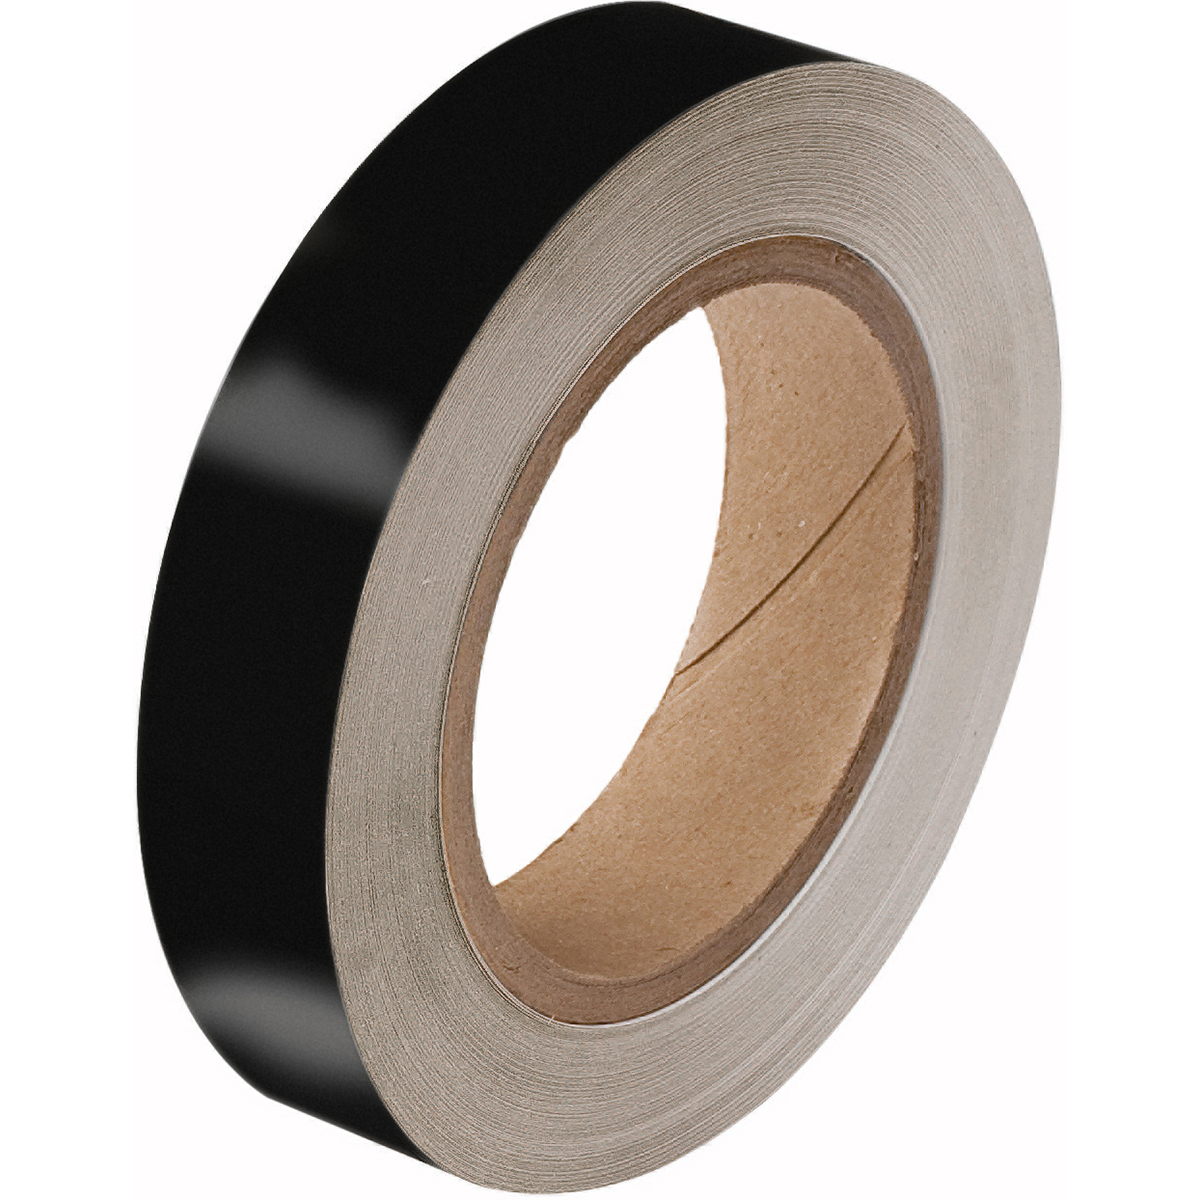 pipe Banding Tape Black 25mm